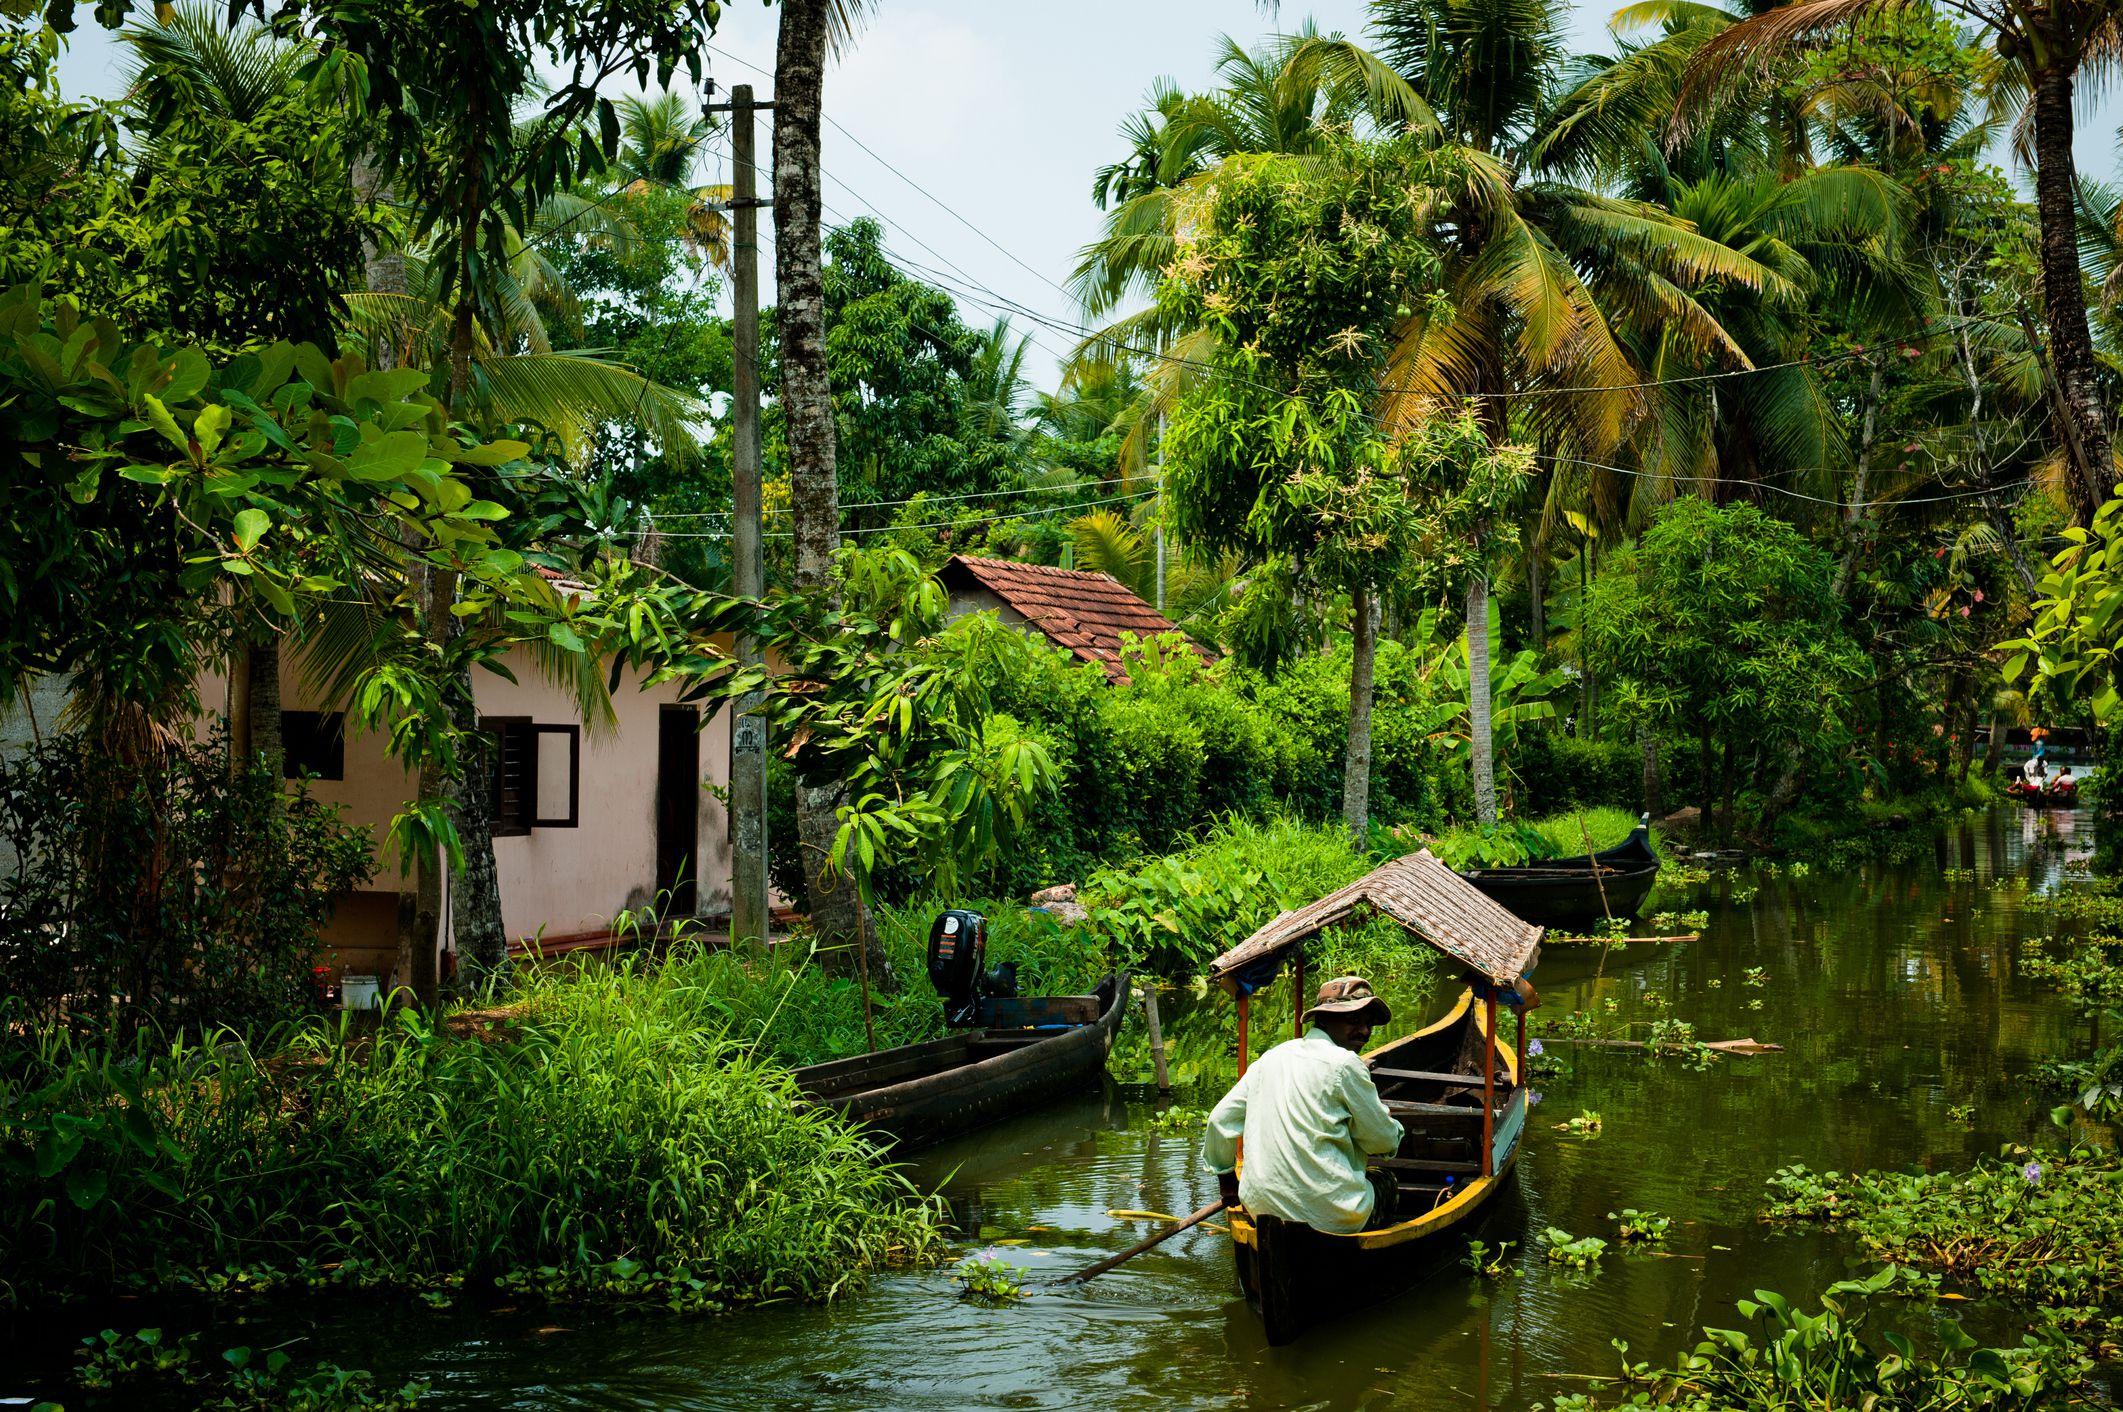 Kerala Backwaters village.